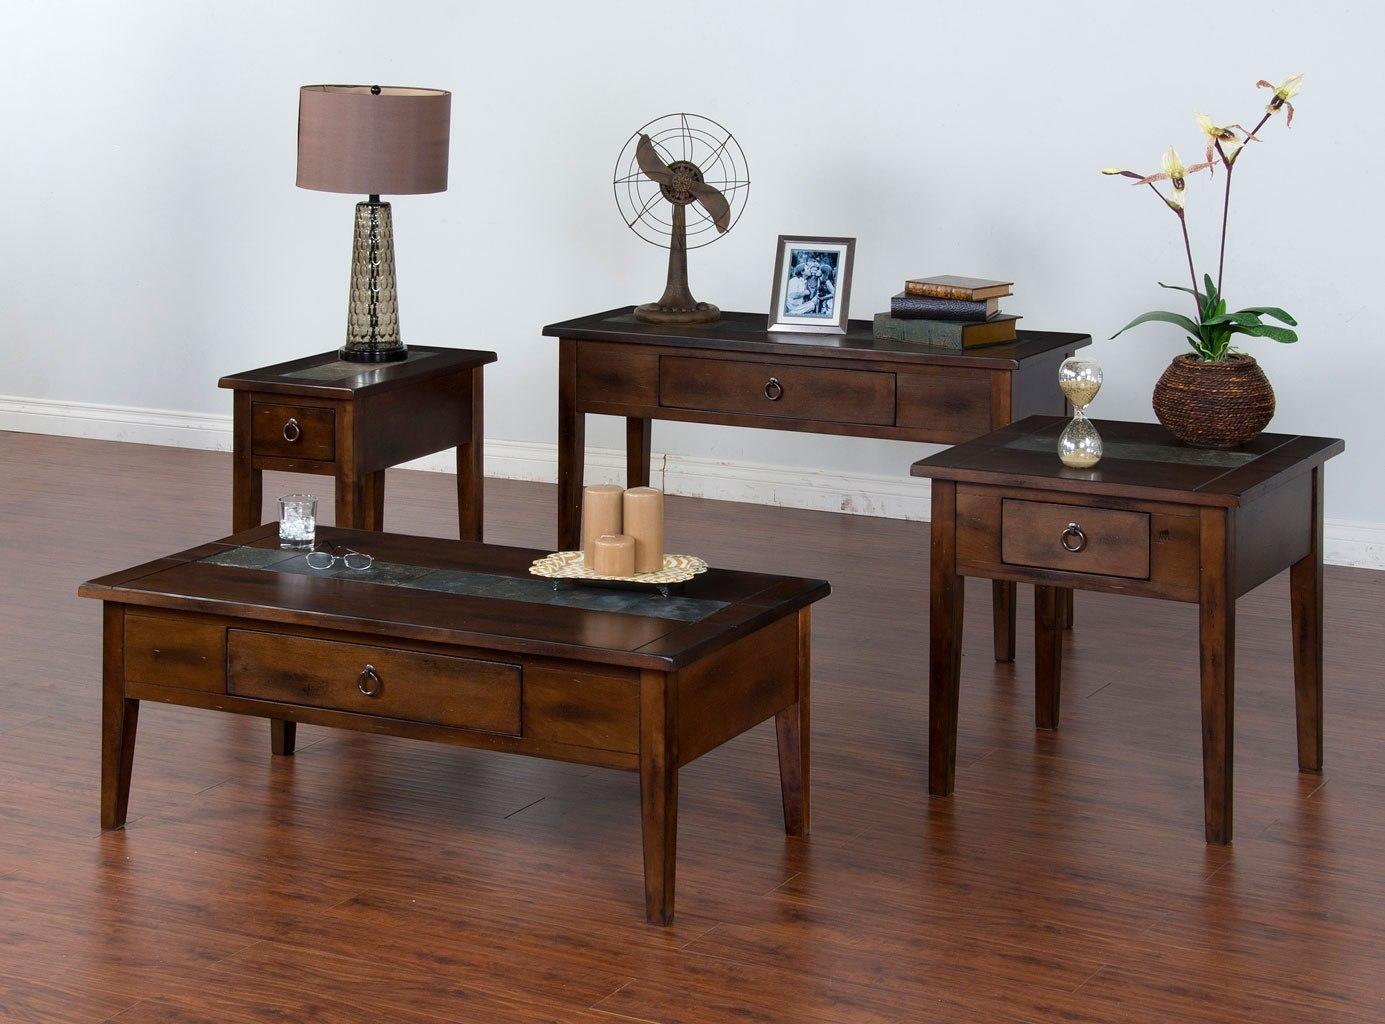 Santa Fe Leg Occasional Table Set By Sunny Designs